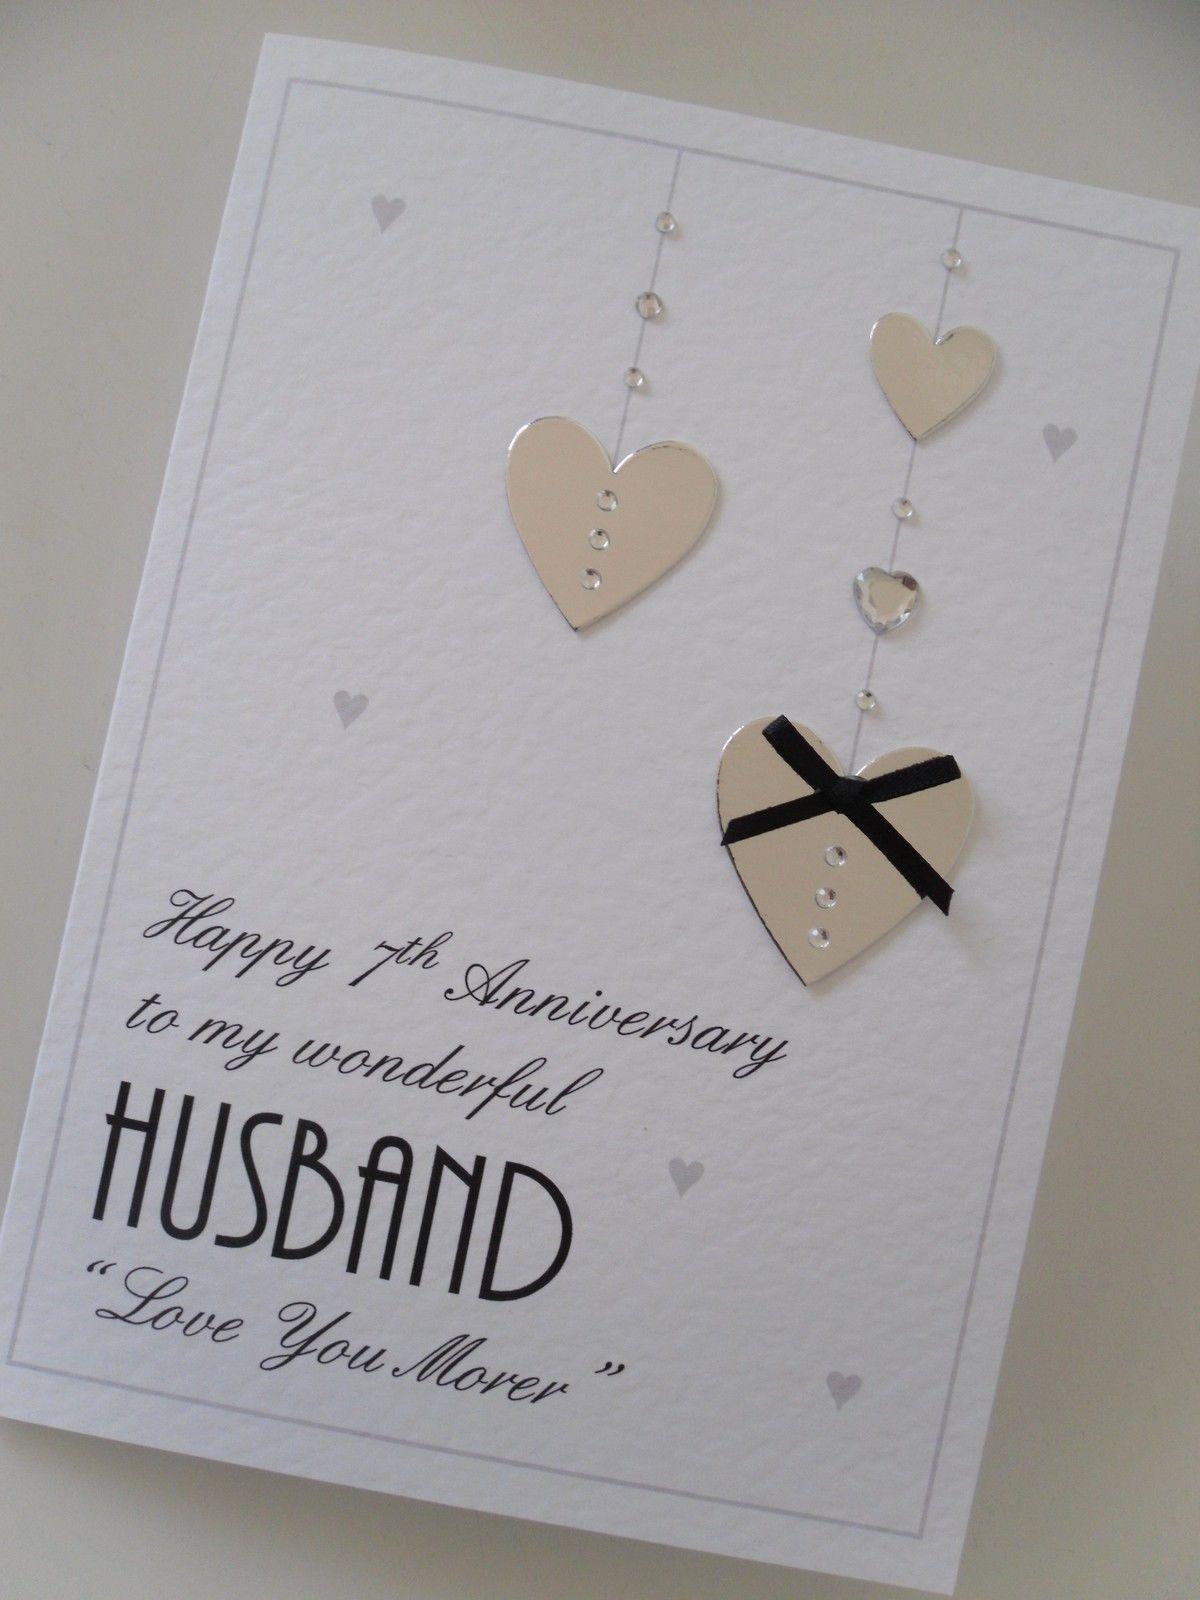 Personalised handmade valentines heart card husbandwife